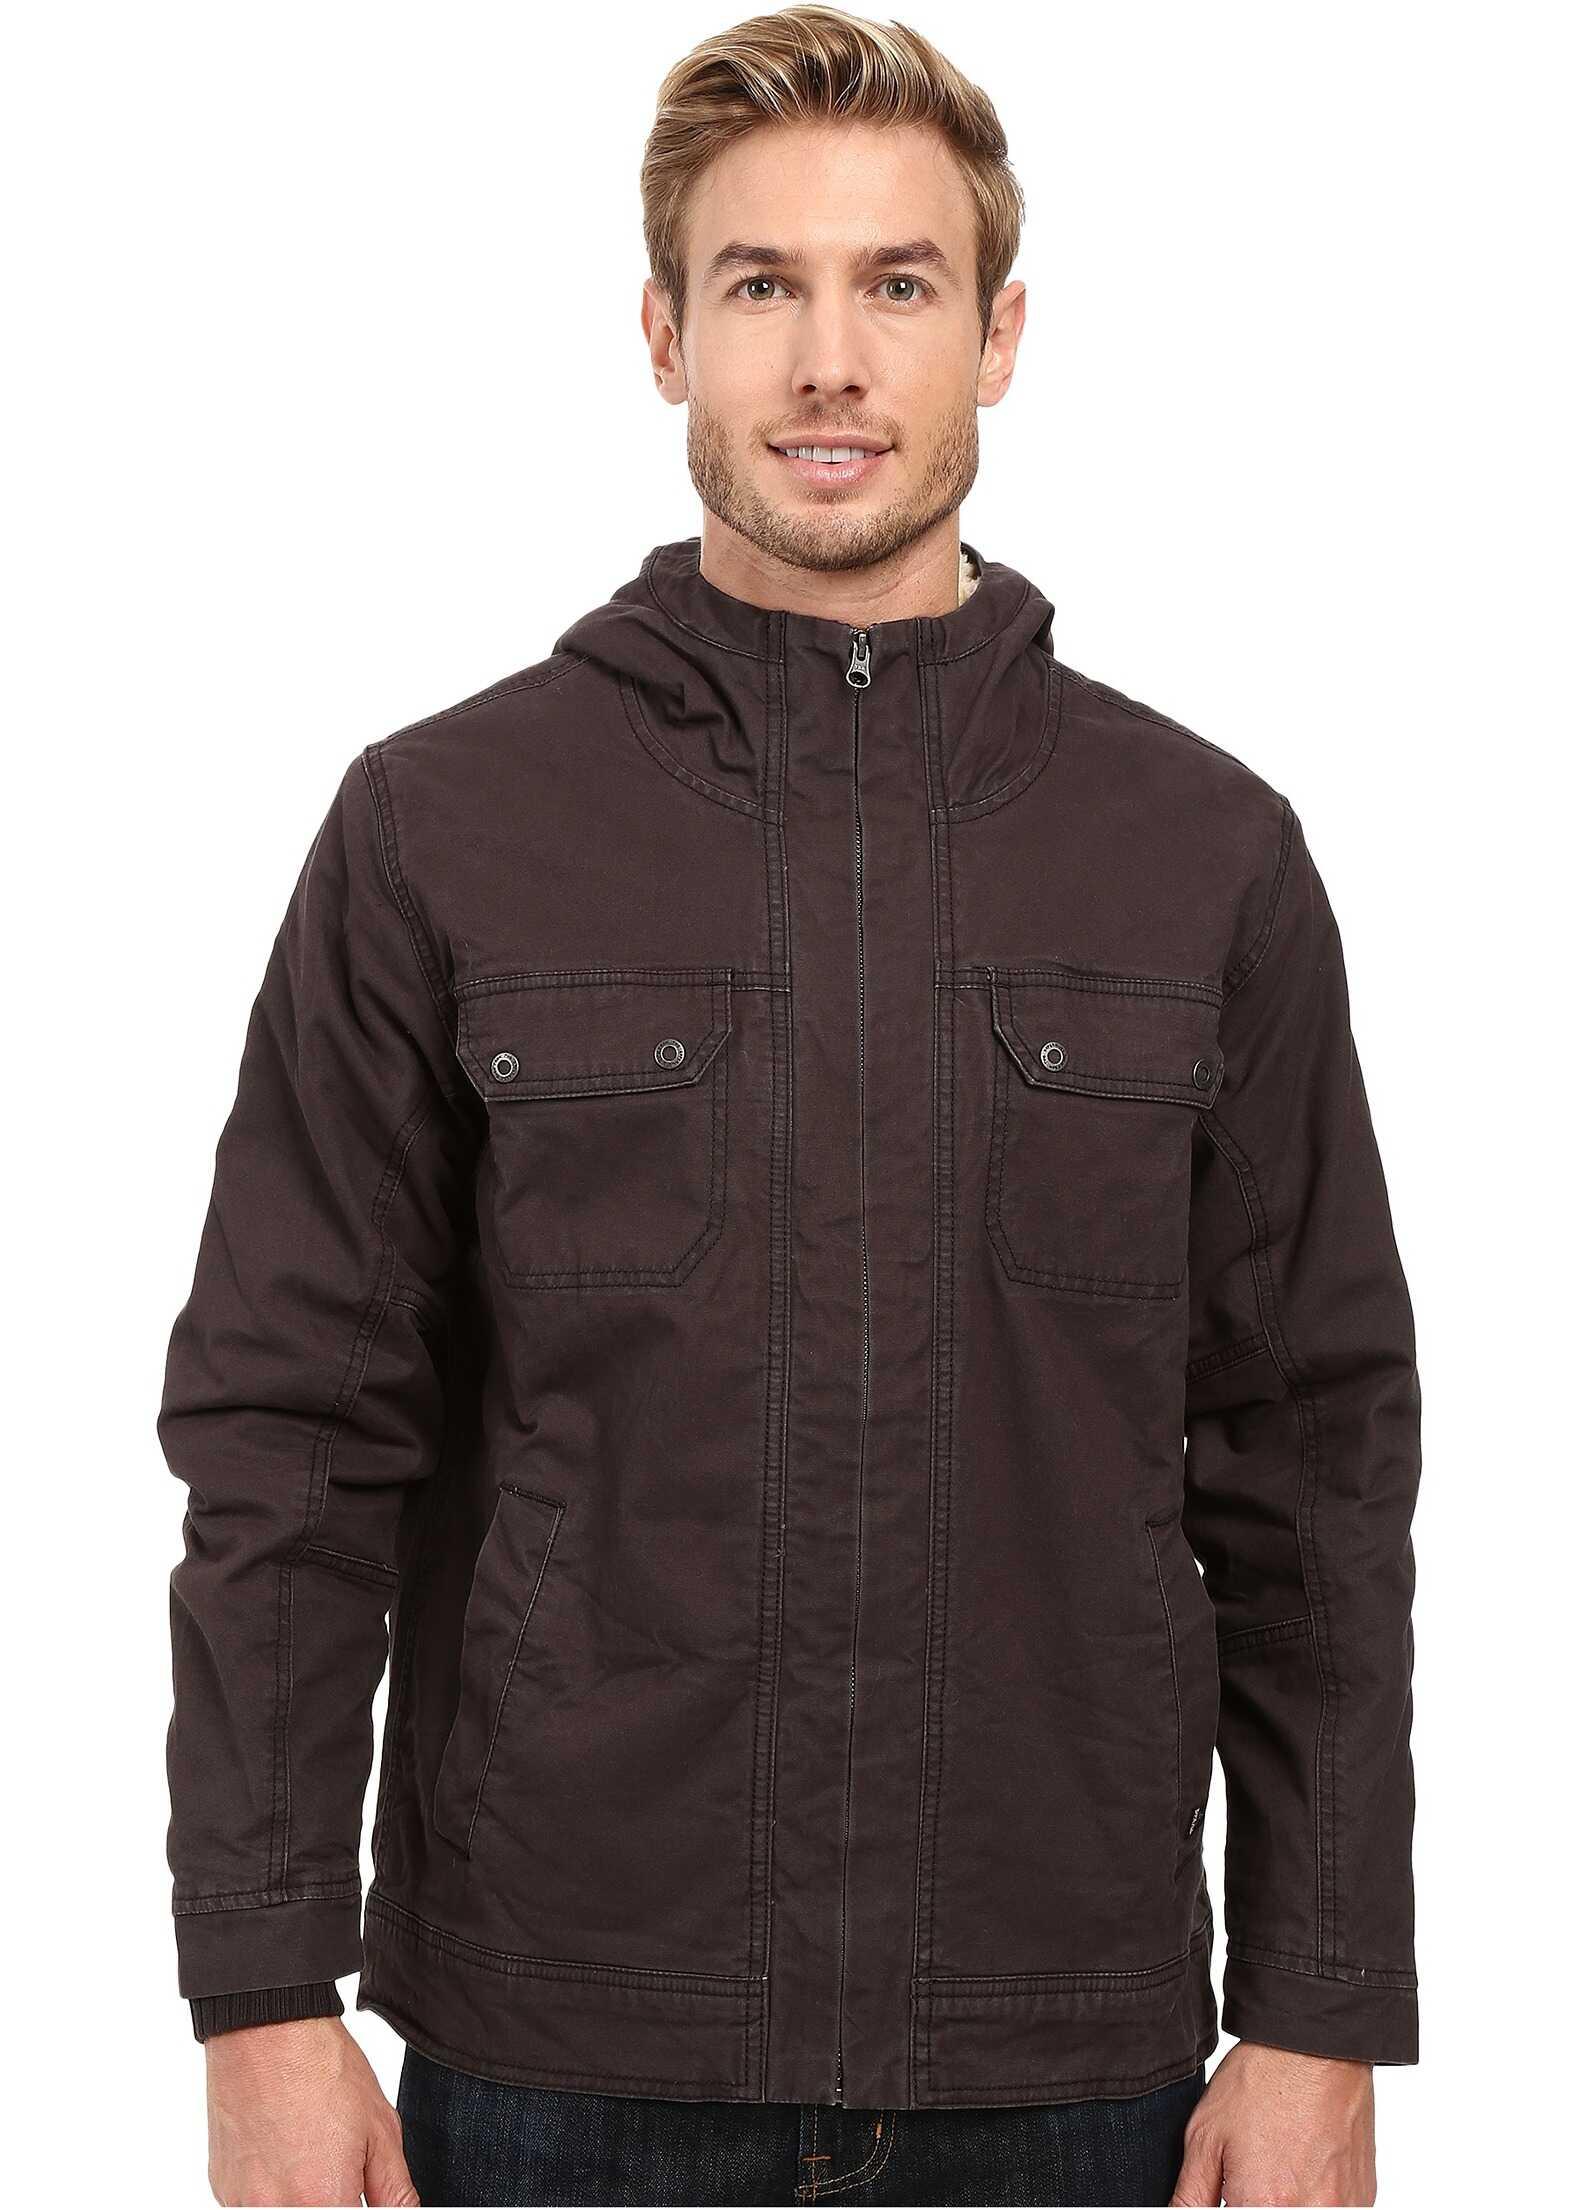 Prana Apperson Jacket Charcoal